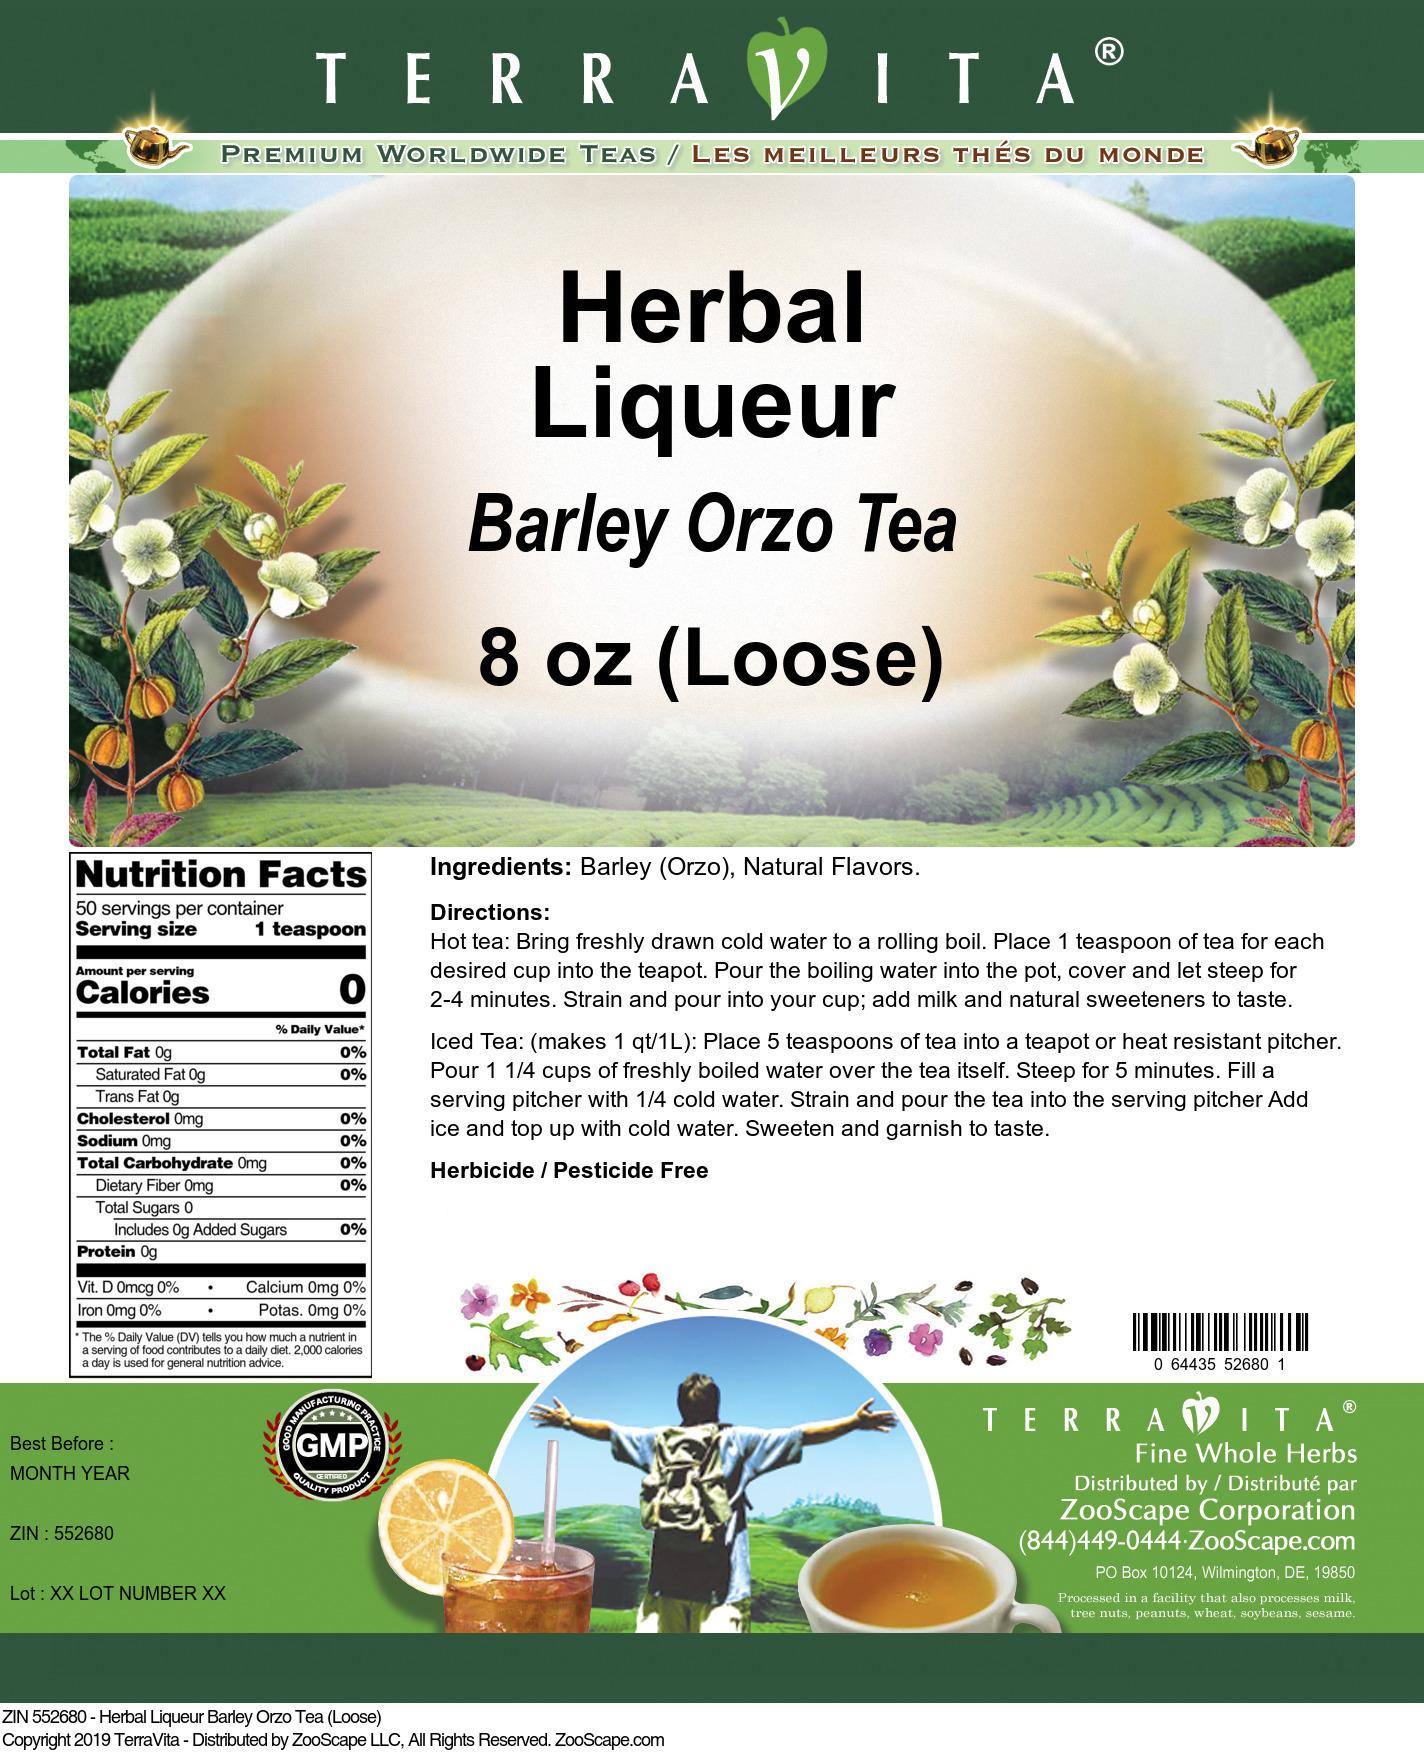 Herbal Liqueur Barley Orzo